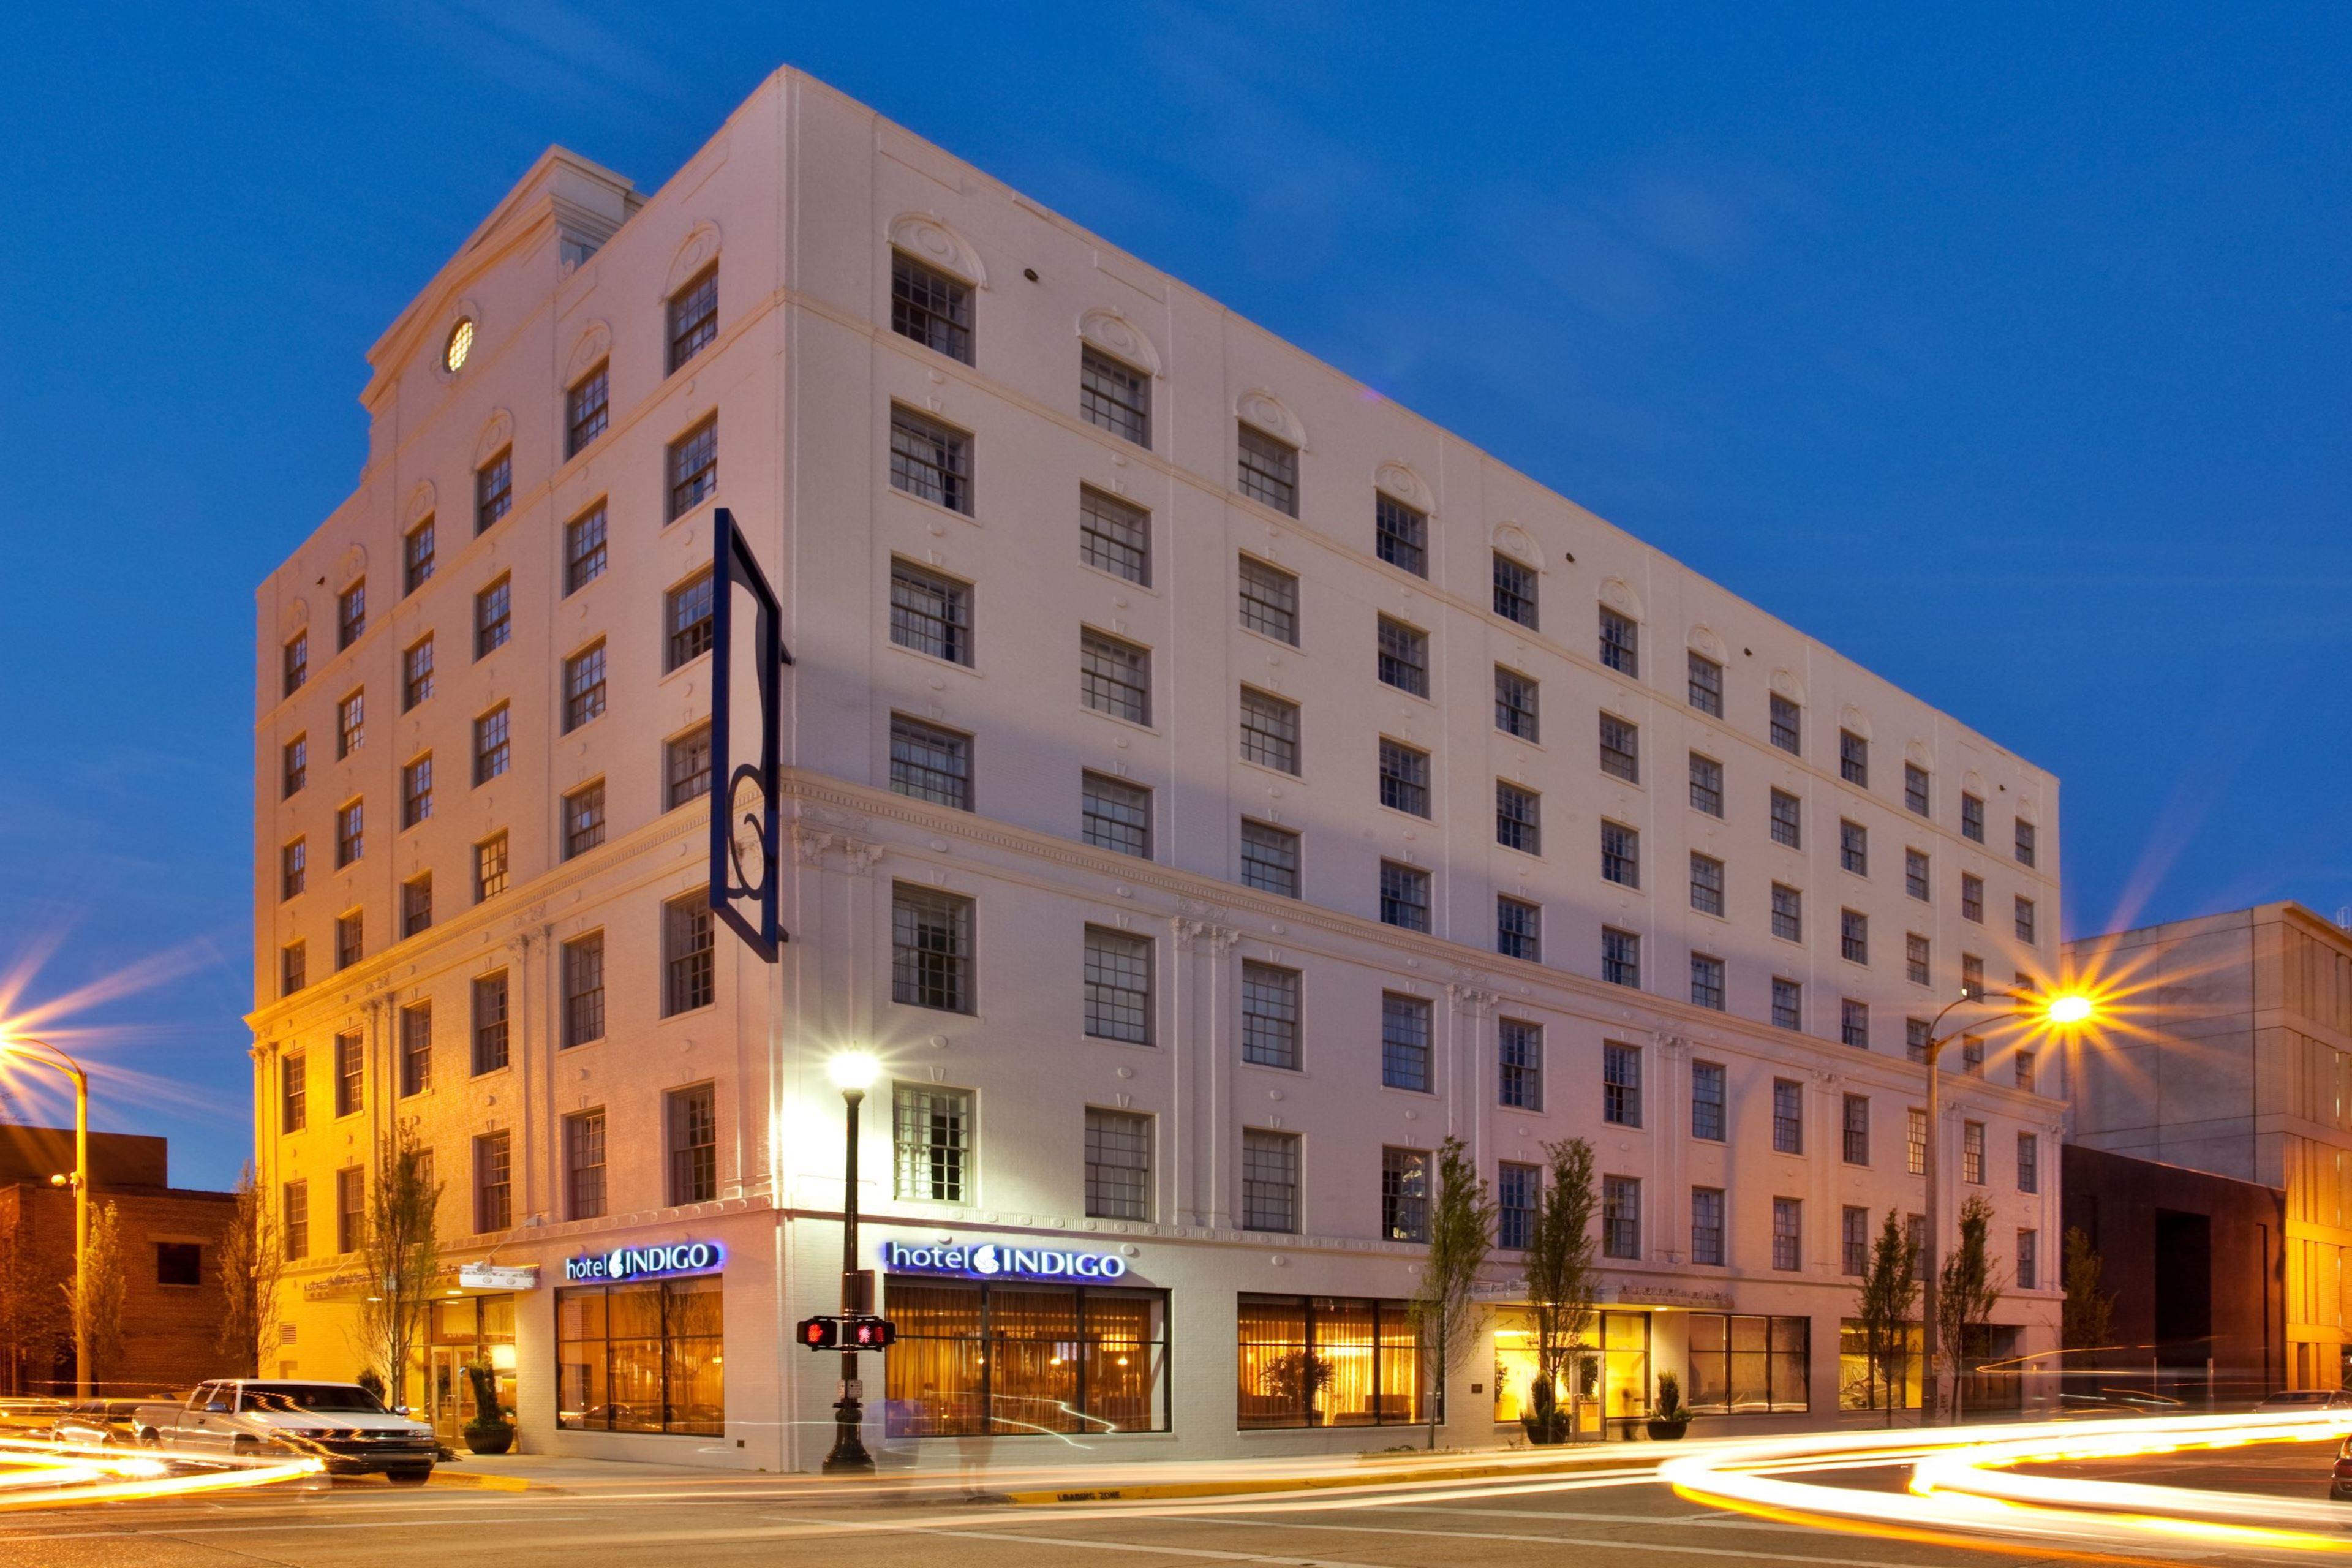 Hotel Indigo Baton Rouge Downtown Baton Rouge La